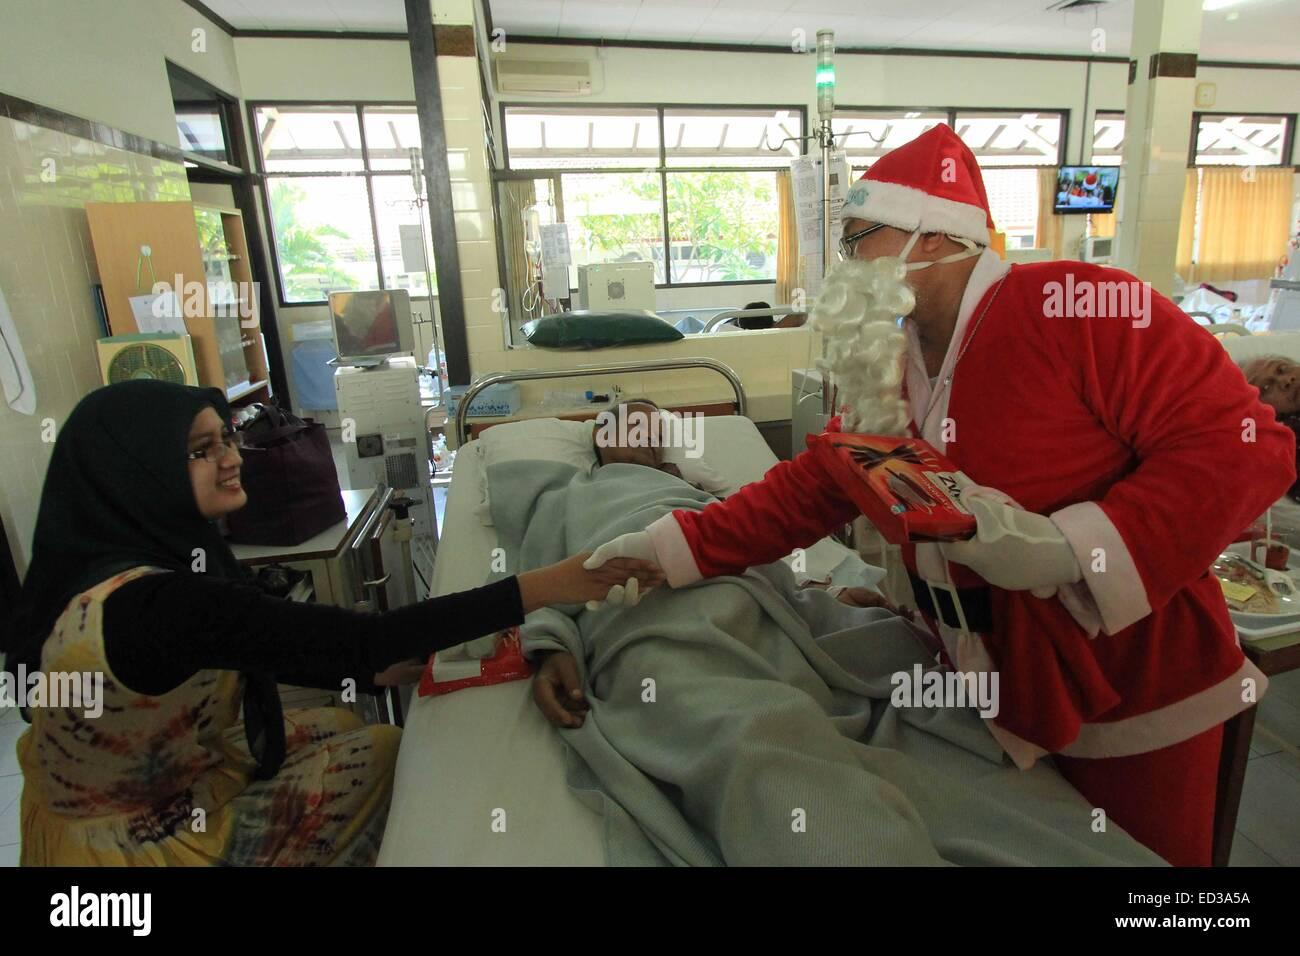 Semarang, Indonesien. 25. Dezember 2014. Ein Mann verkleidet als ...